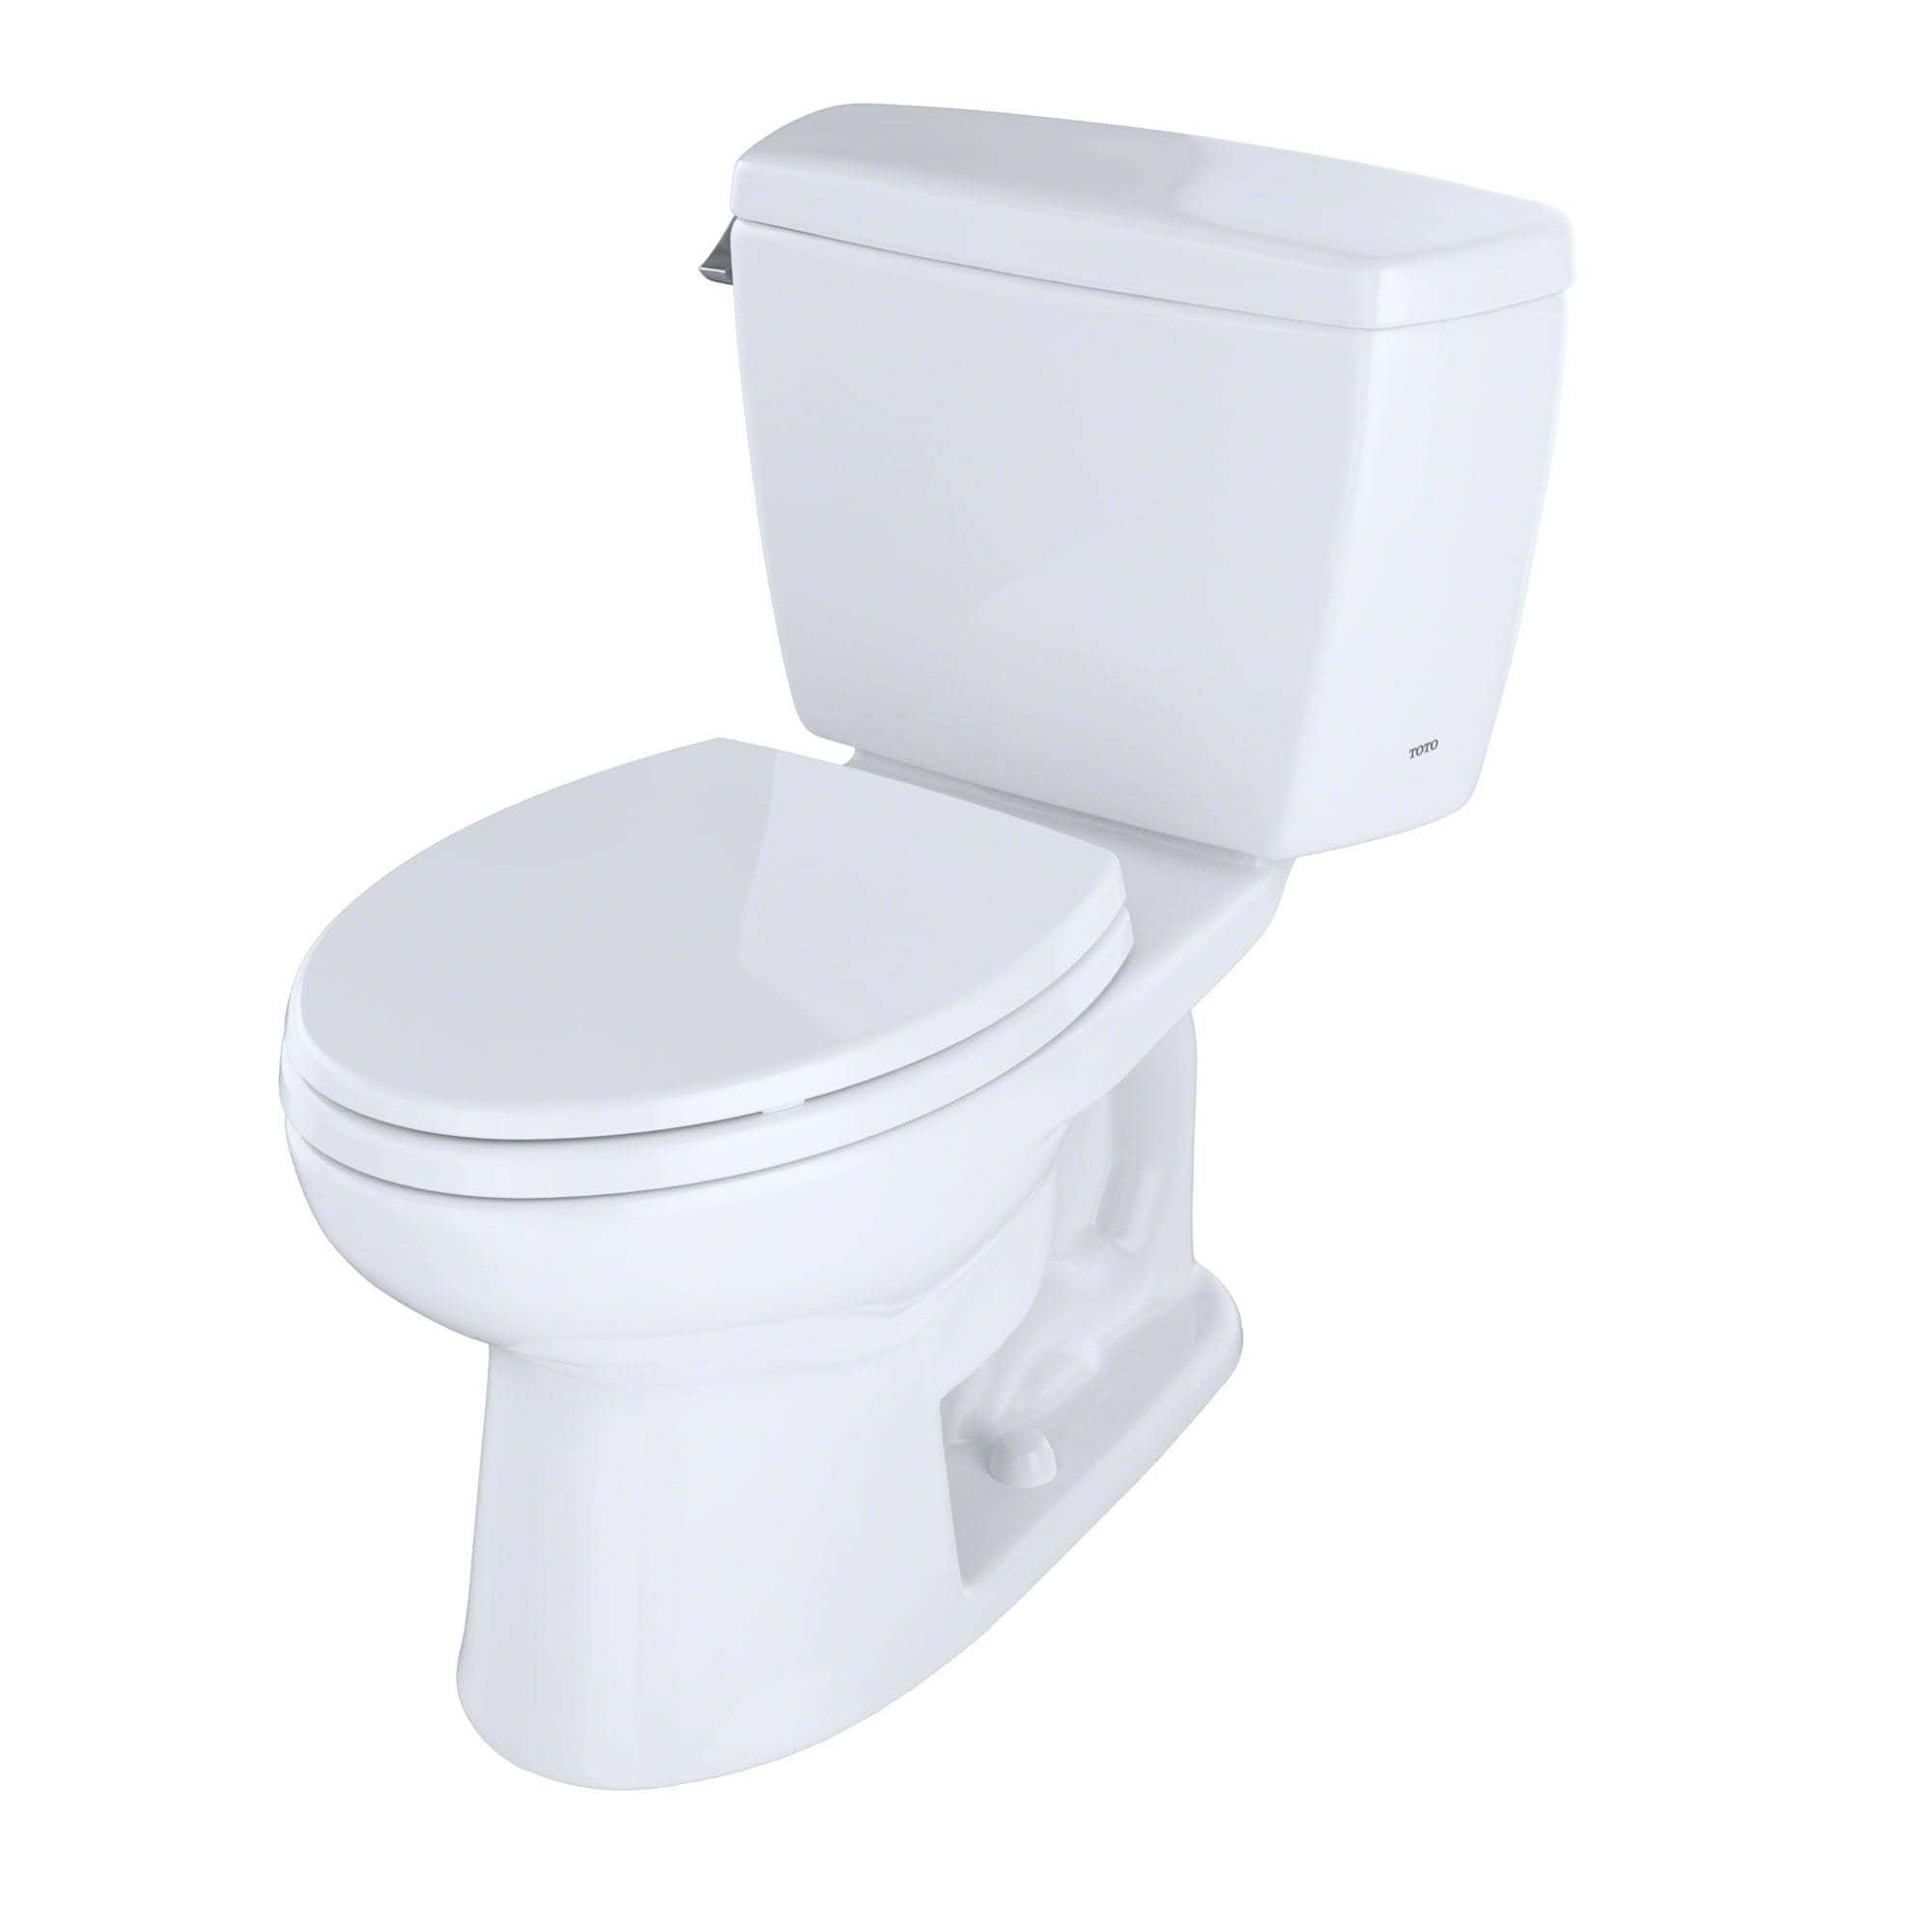 Toto Cw421jsw420jp Putih2 Daftar Harga Terbaru Dan Terlengkap Tx403sb Shower Spray With Stop Valve Putih Shop Drake Two Piece Elongated 16 Gpf Universal Height Toilet